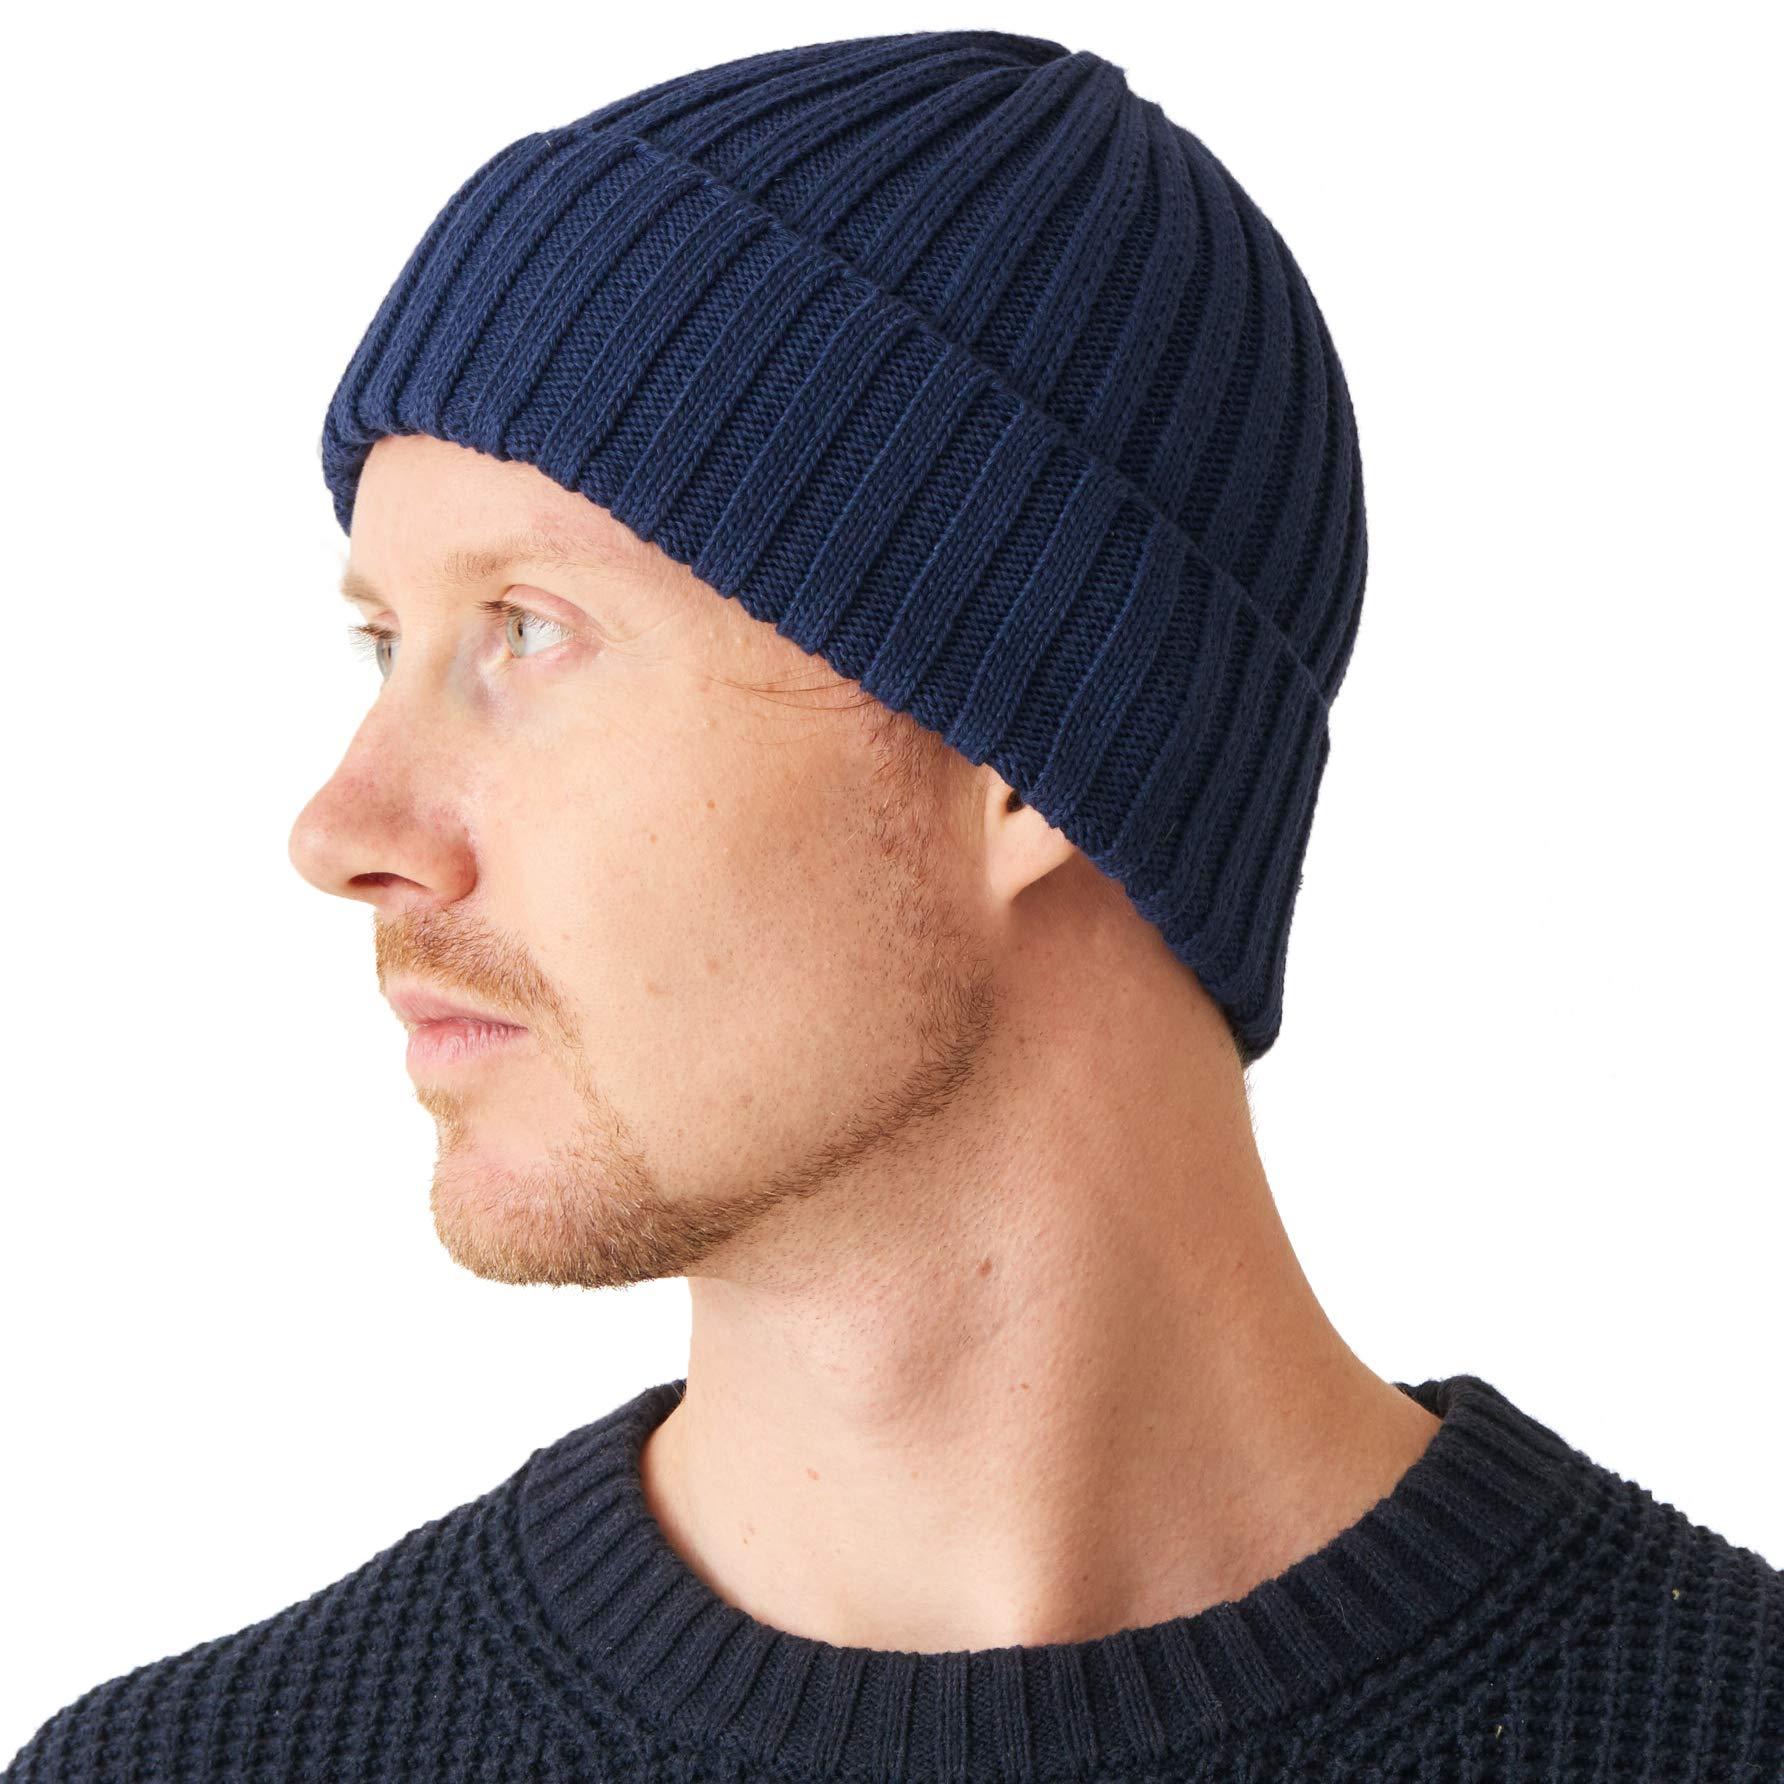 CHARM Mens Fisherman's Beanie Hat - Cotton Slouch Cap Women Chemo Knit Winter